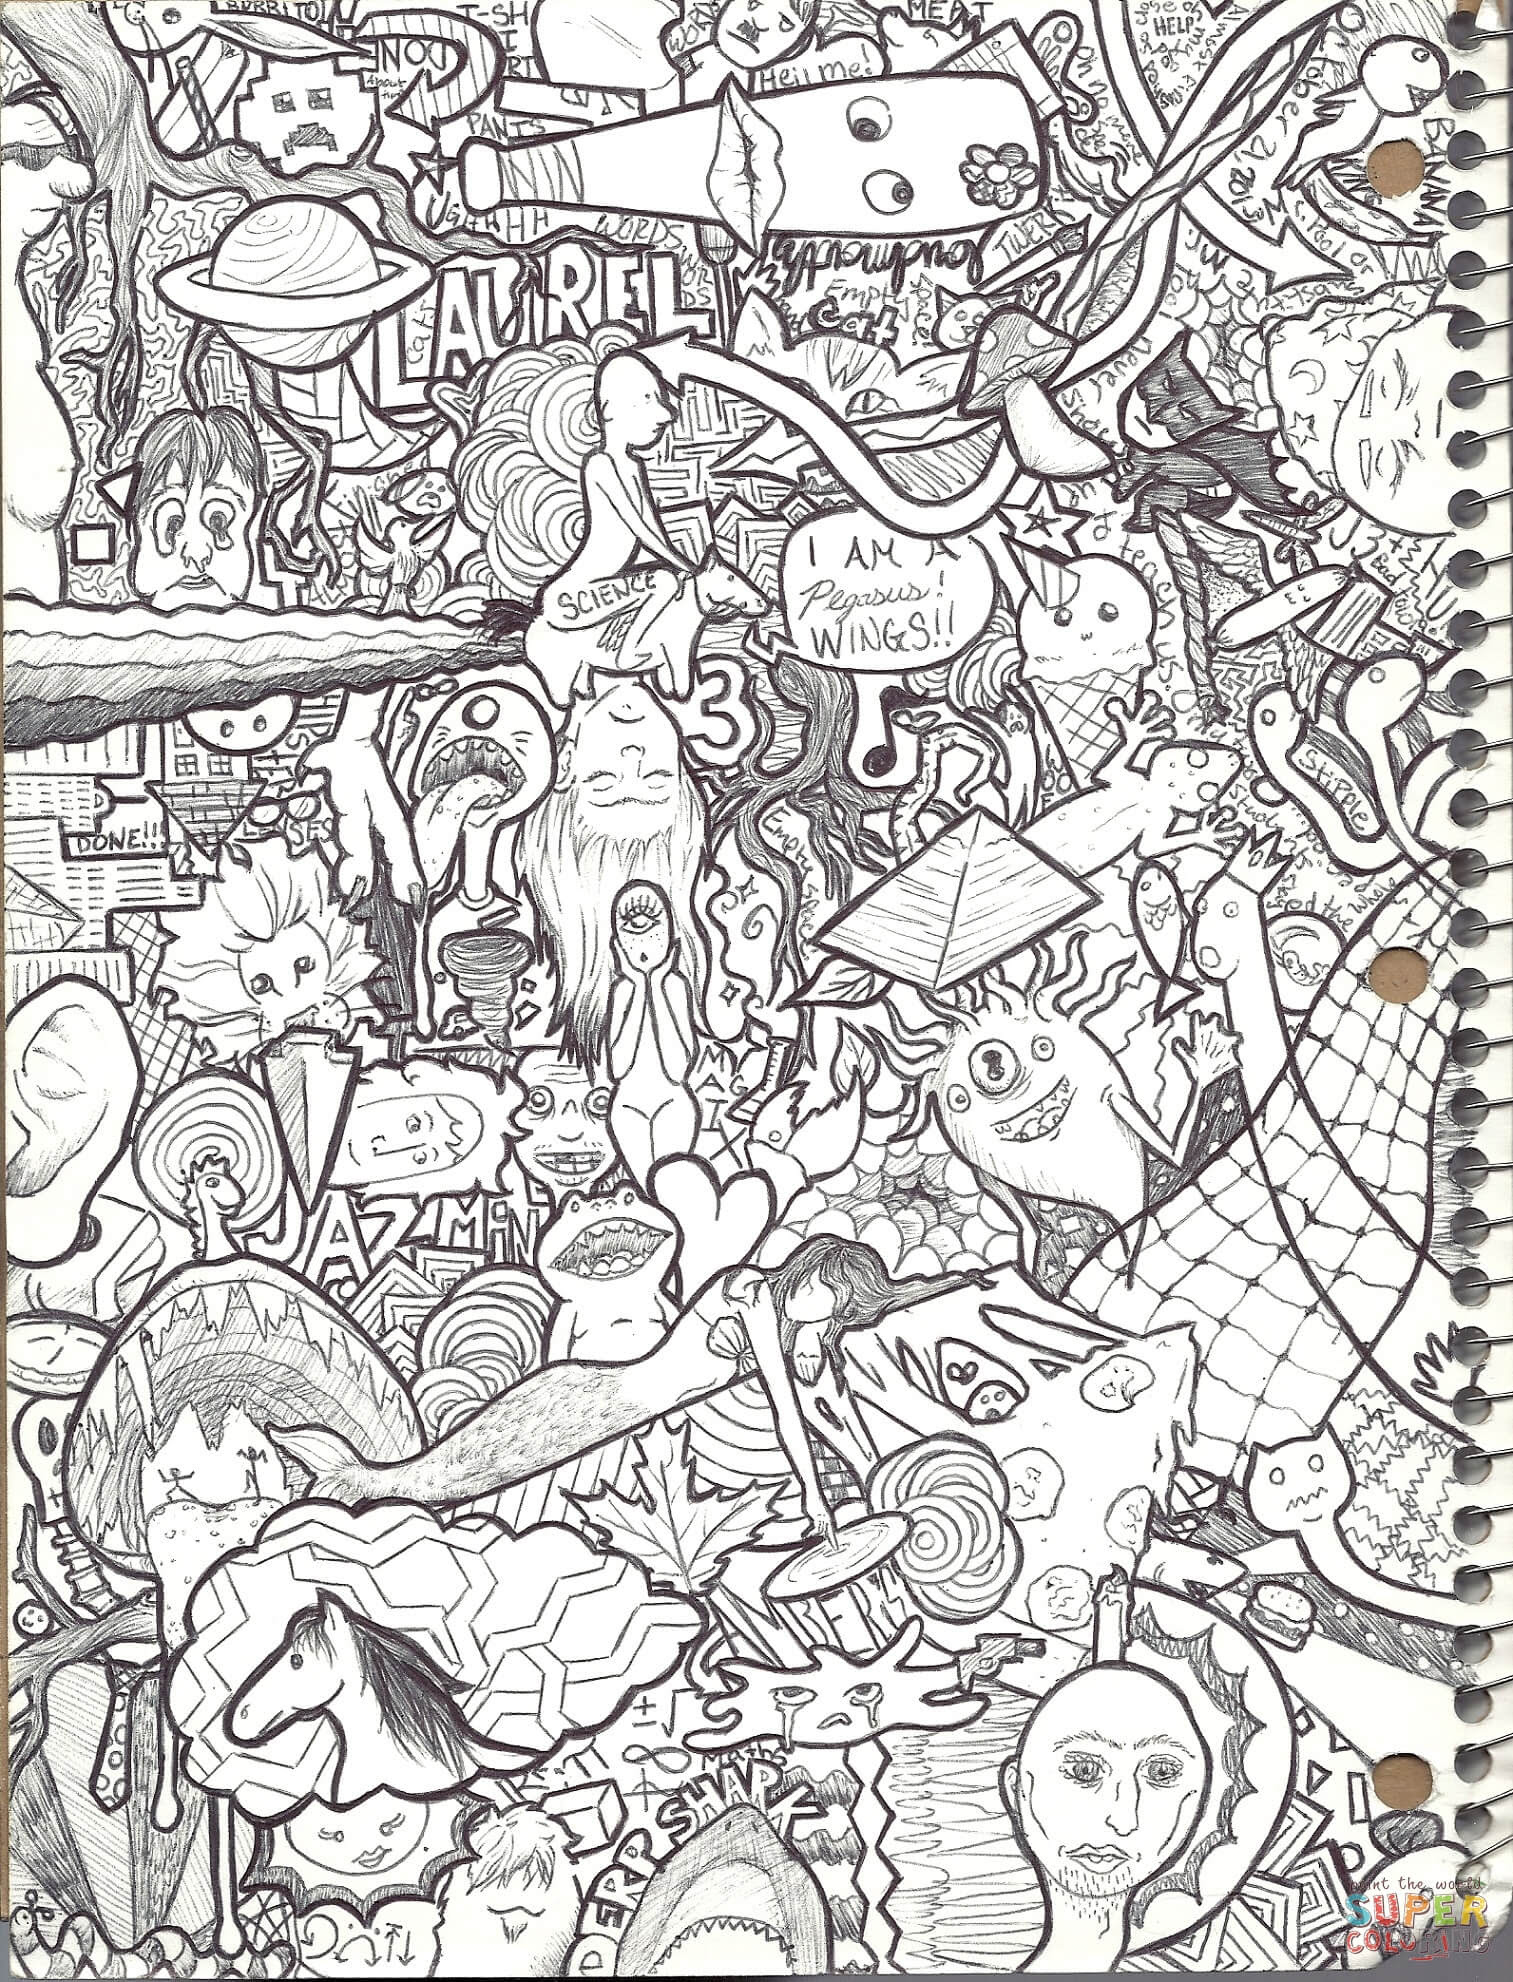 Avengers Ausmalbilder Zum Ausdrucken Best Kids N Fun Beim: Download Free Doodle Art To Print And Color